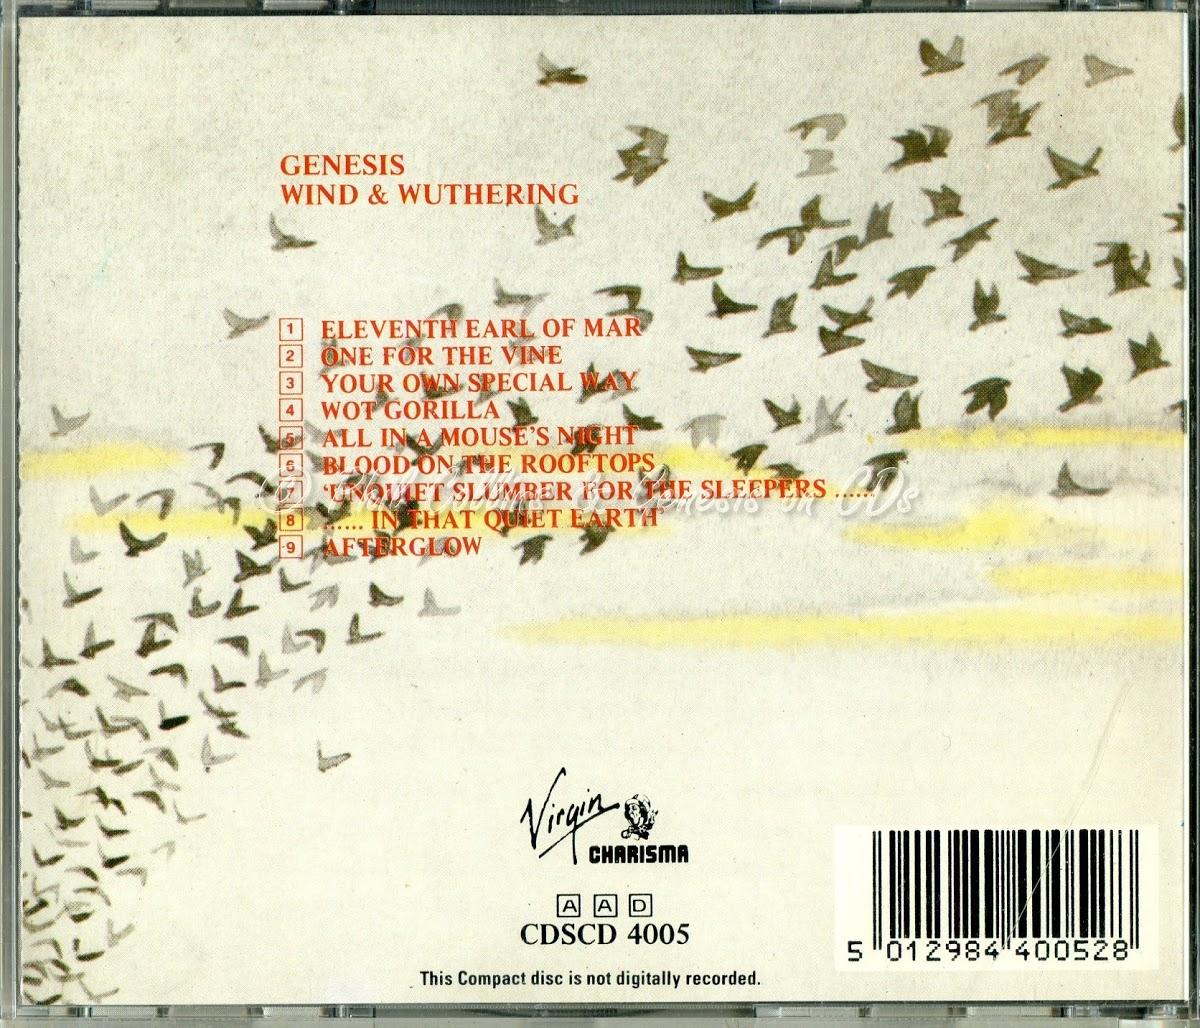 Virgin barcode